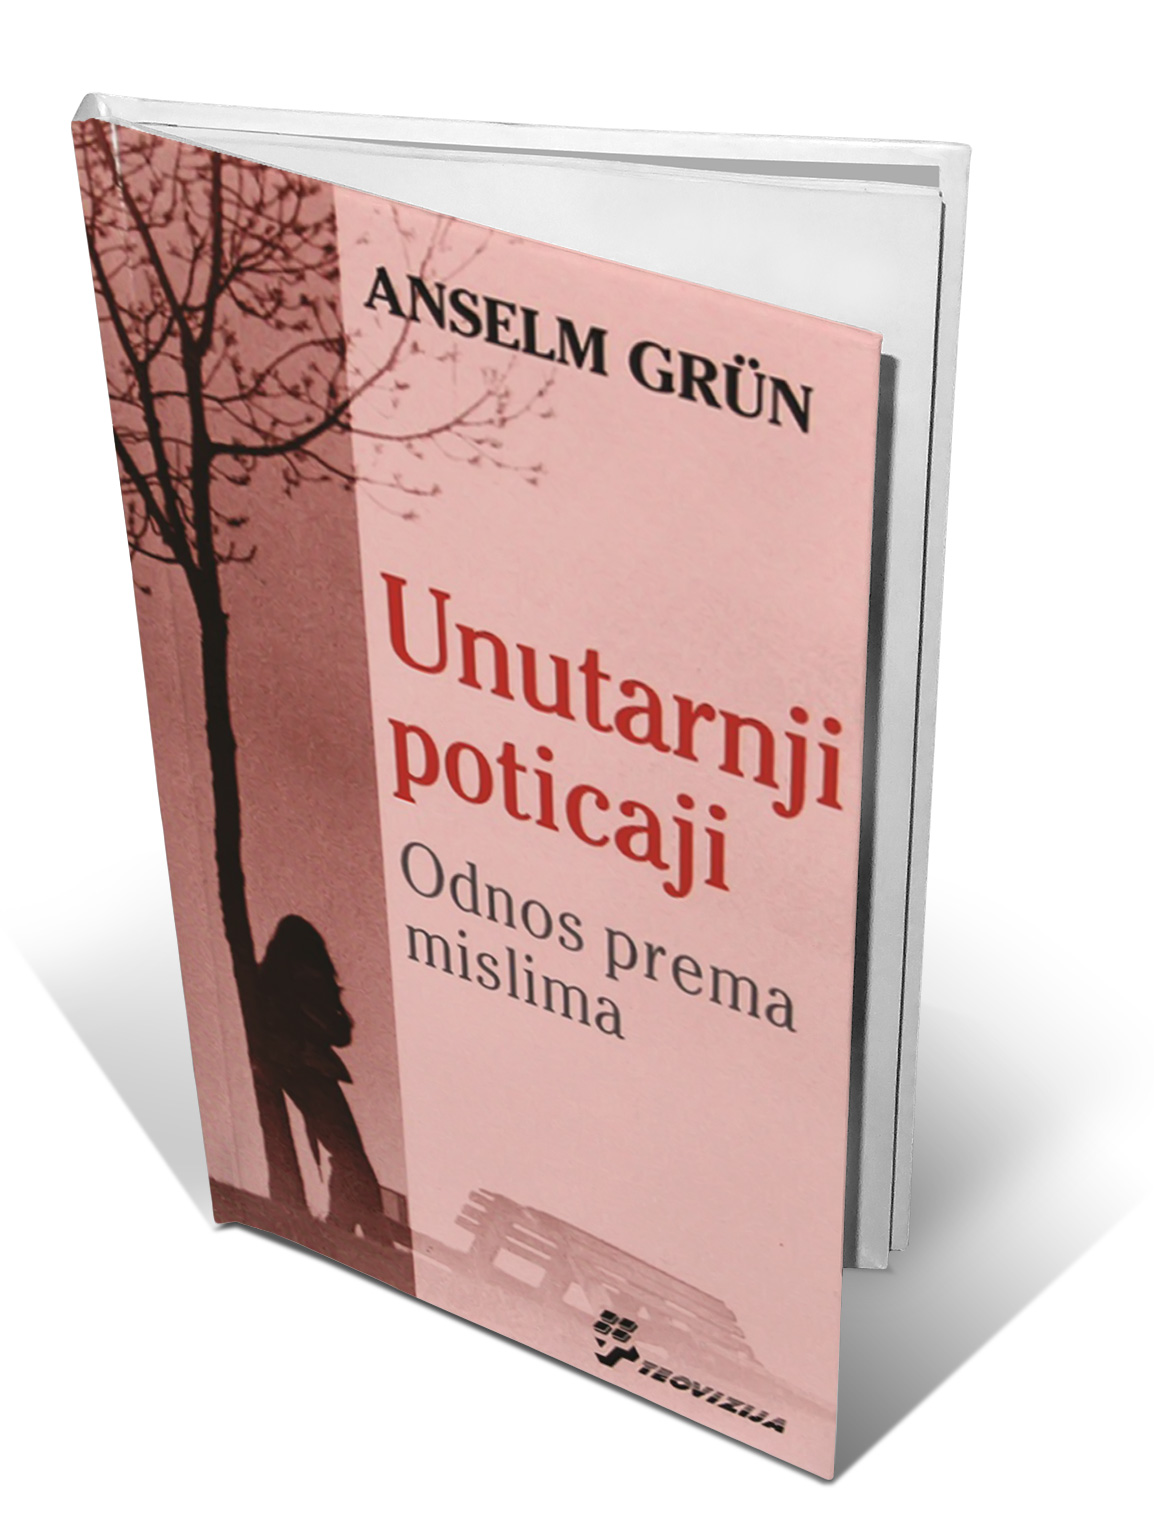 UNUTARNJI POTICAJI - Anselm Grün